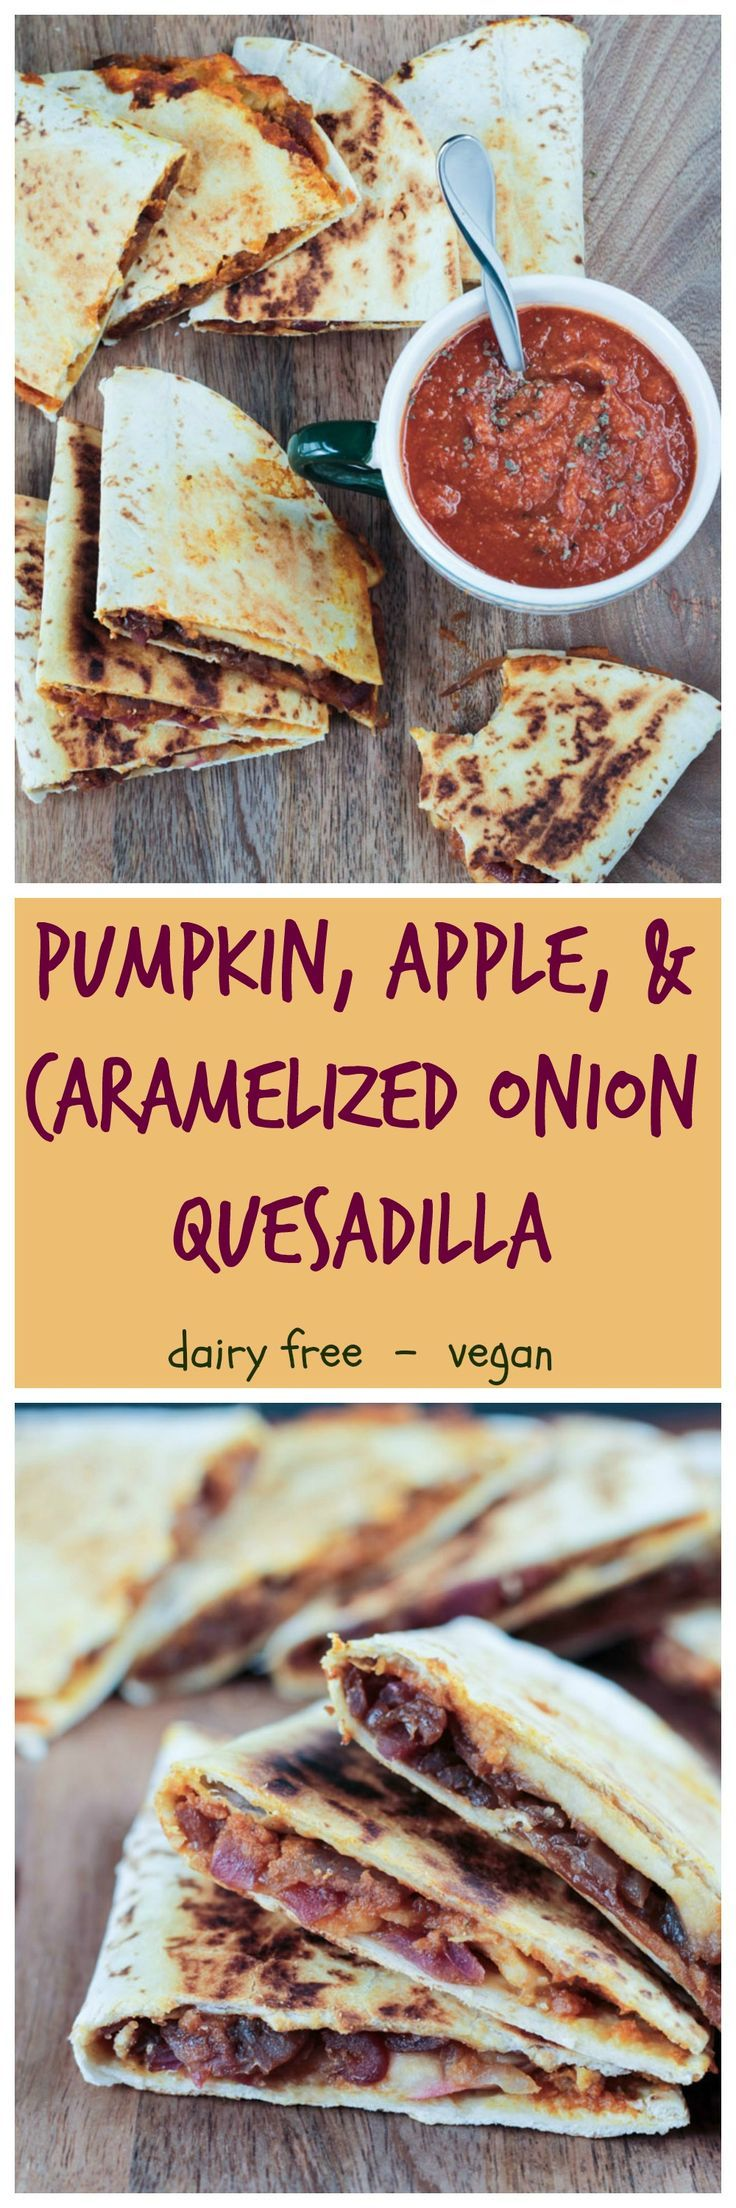 Pumpkin, Apple & Caramelized Onion Quesadilla - crispy, creamy, sweet, smoky, spicy - a little piece of fall heaven! And it's vegan!